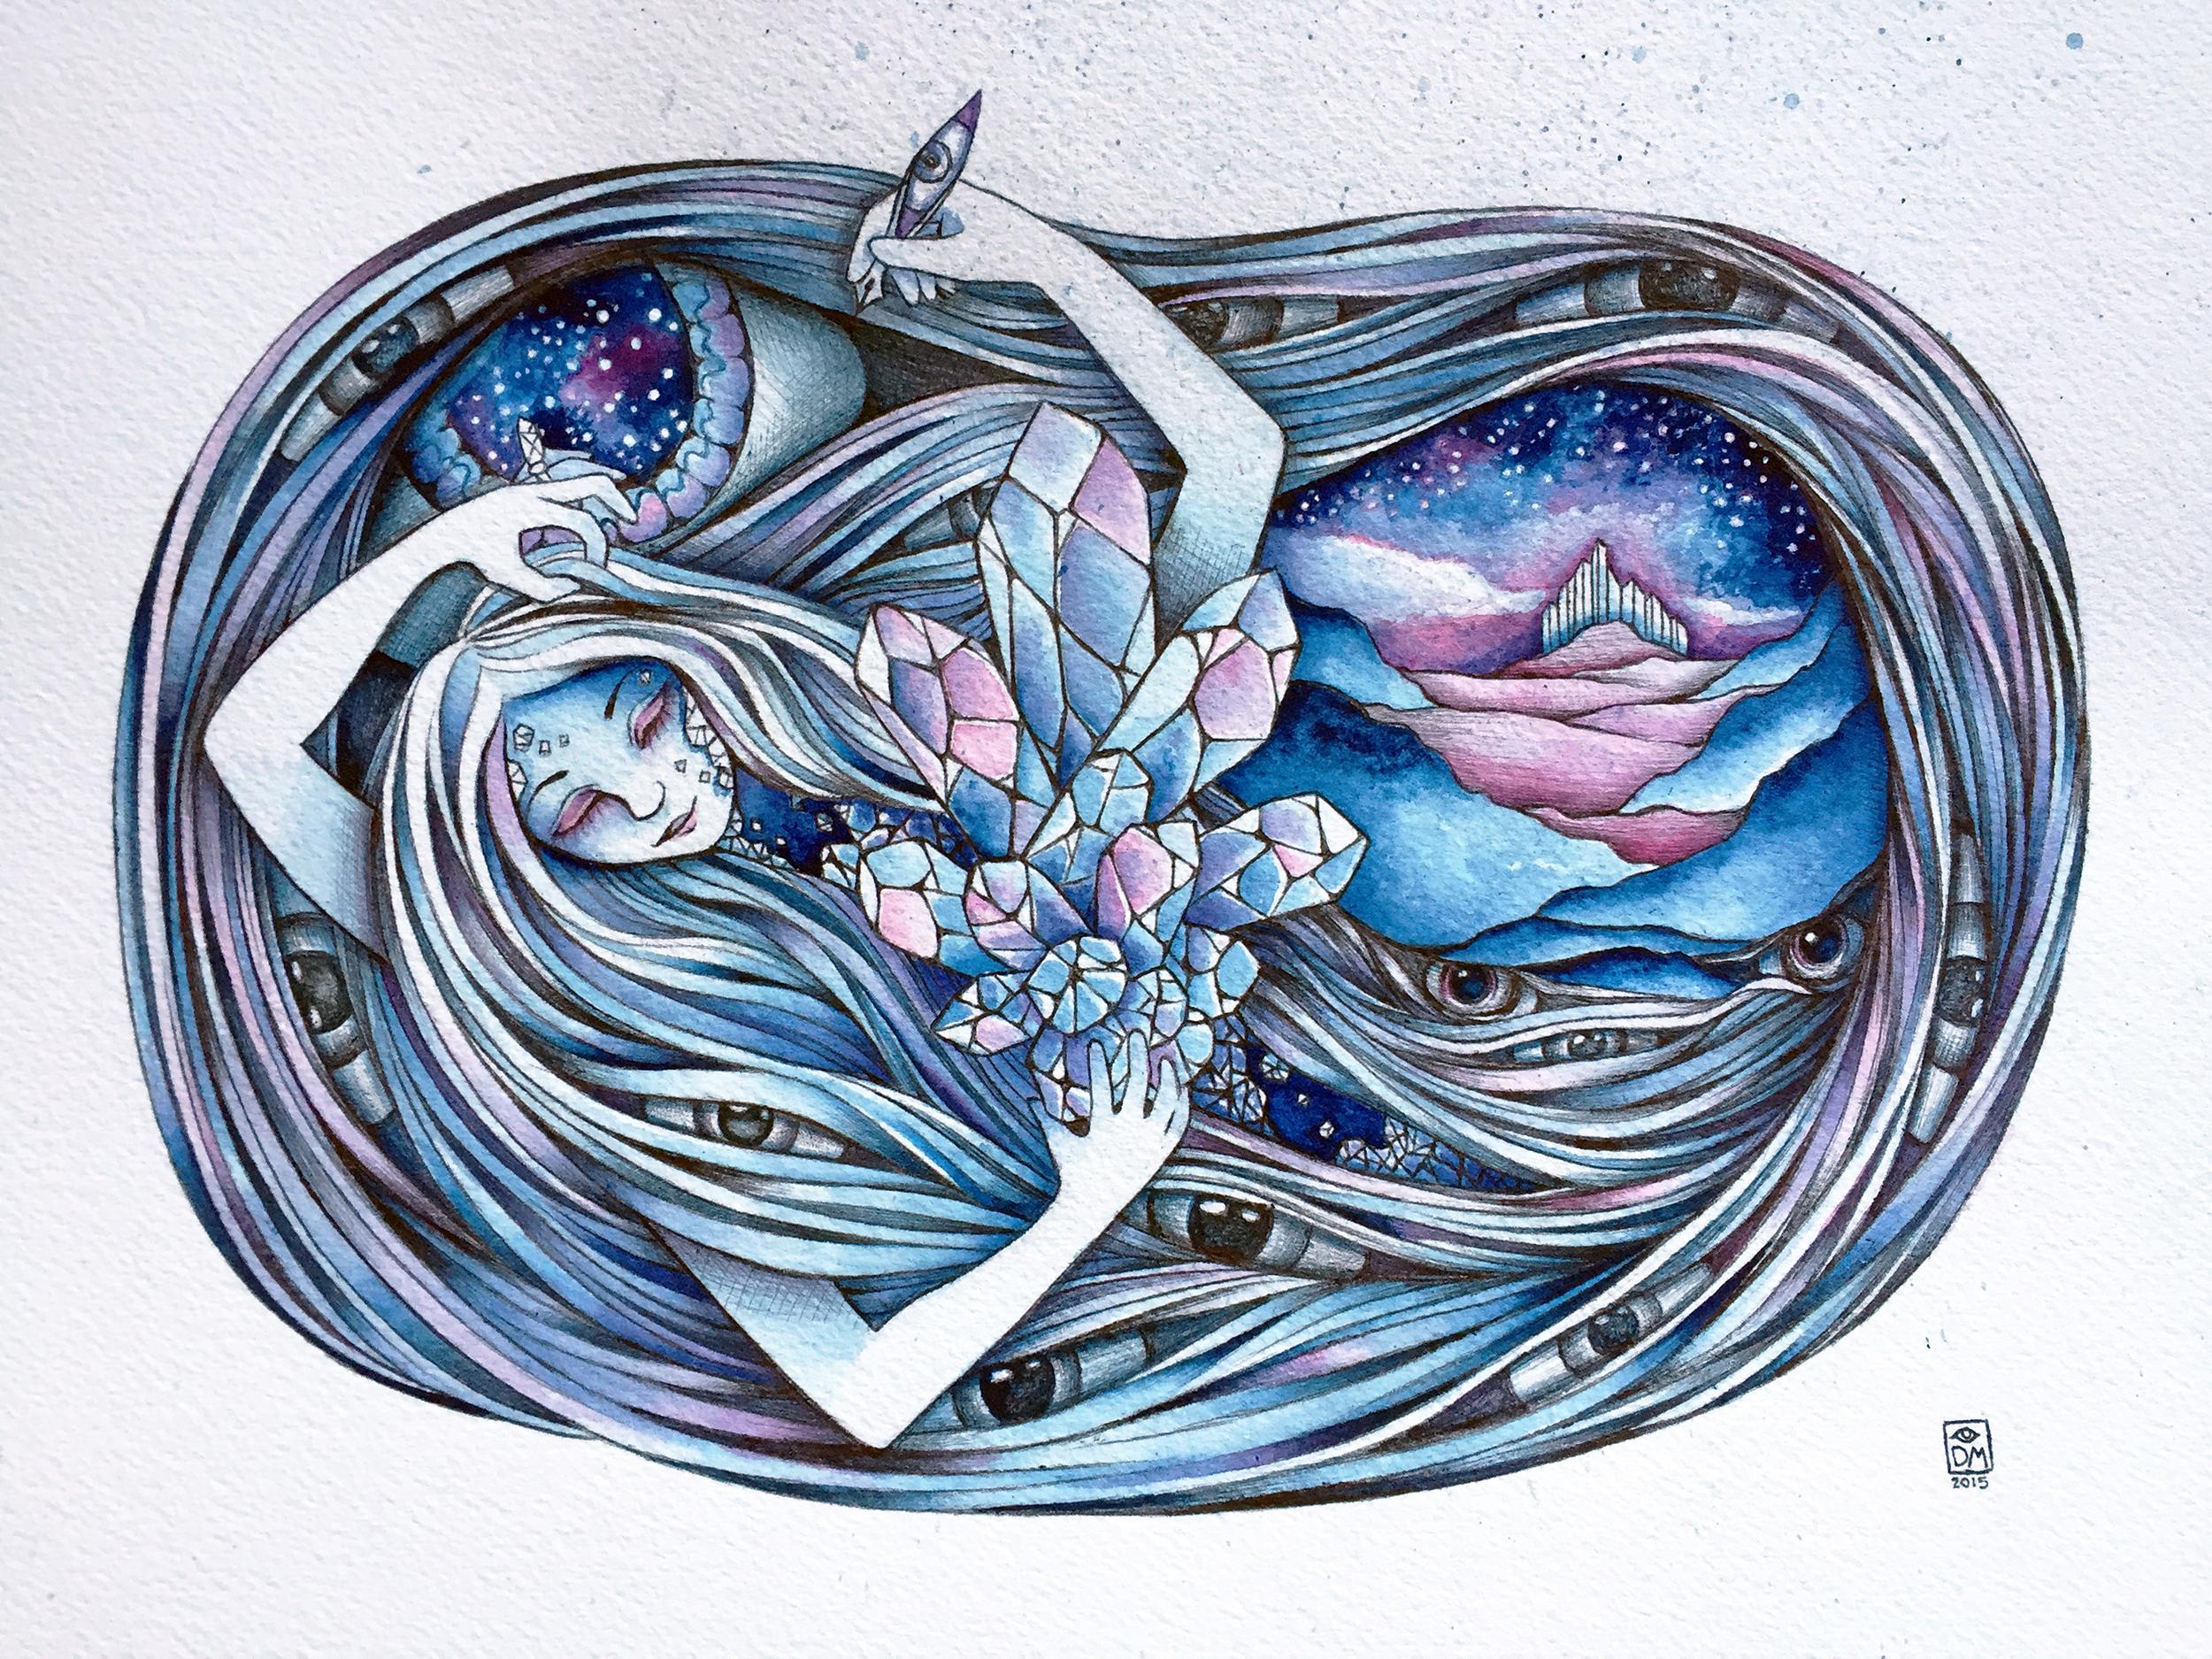 Dreamcycle-by-Danielle-Morgan.jpg